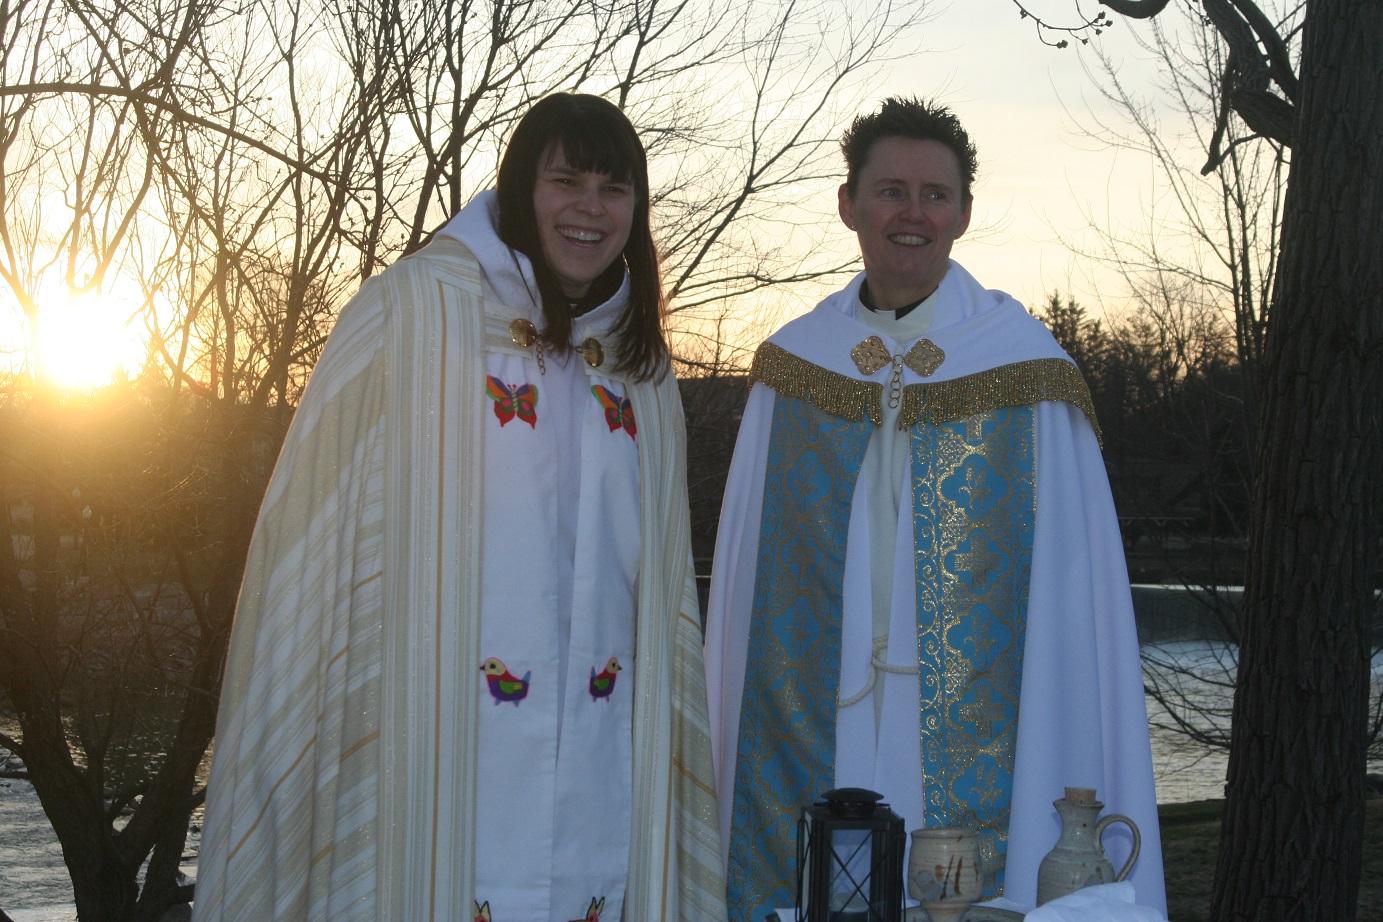 Rev. Margaret & Rev. Anne Anderson